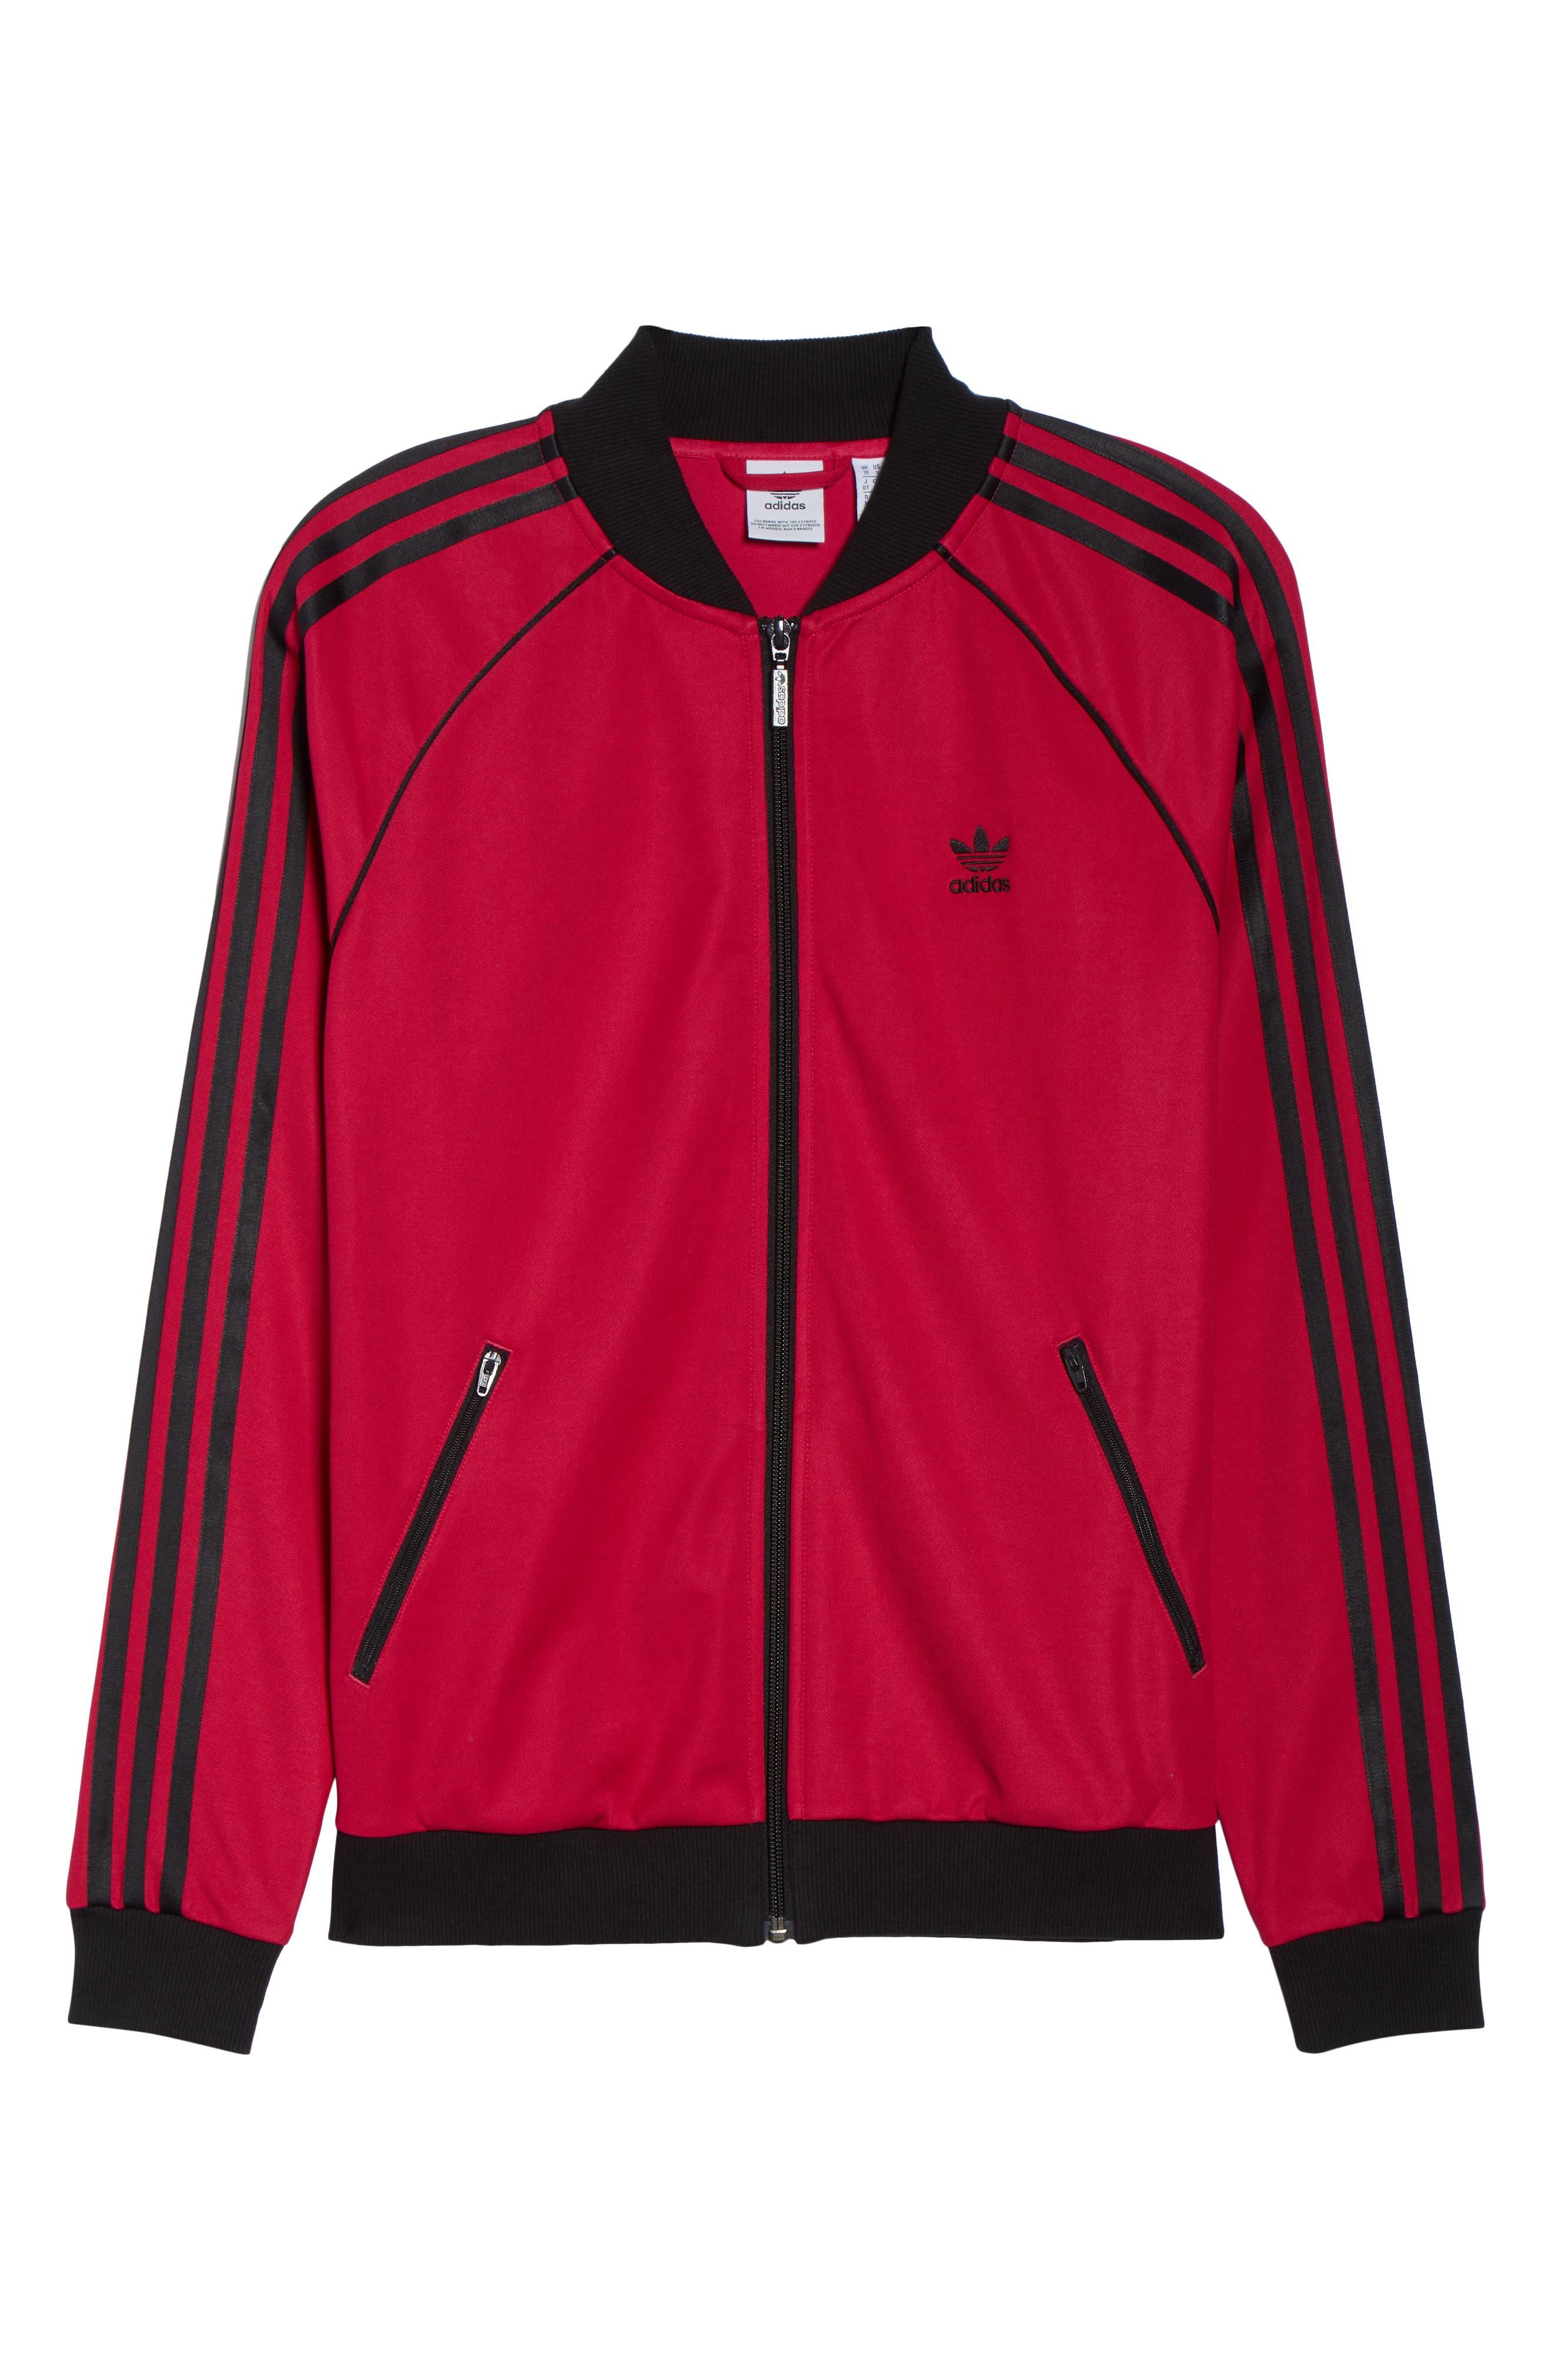 adidas Track Jacket,                             Alternate thumbnail 7, color,                             650